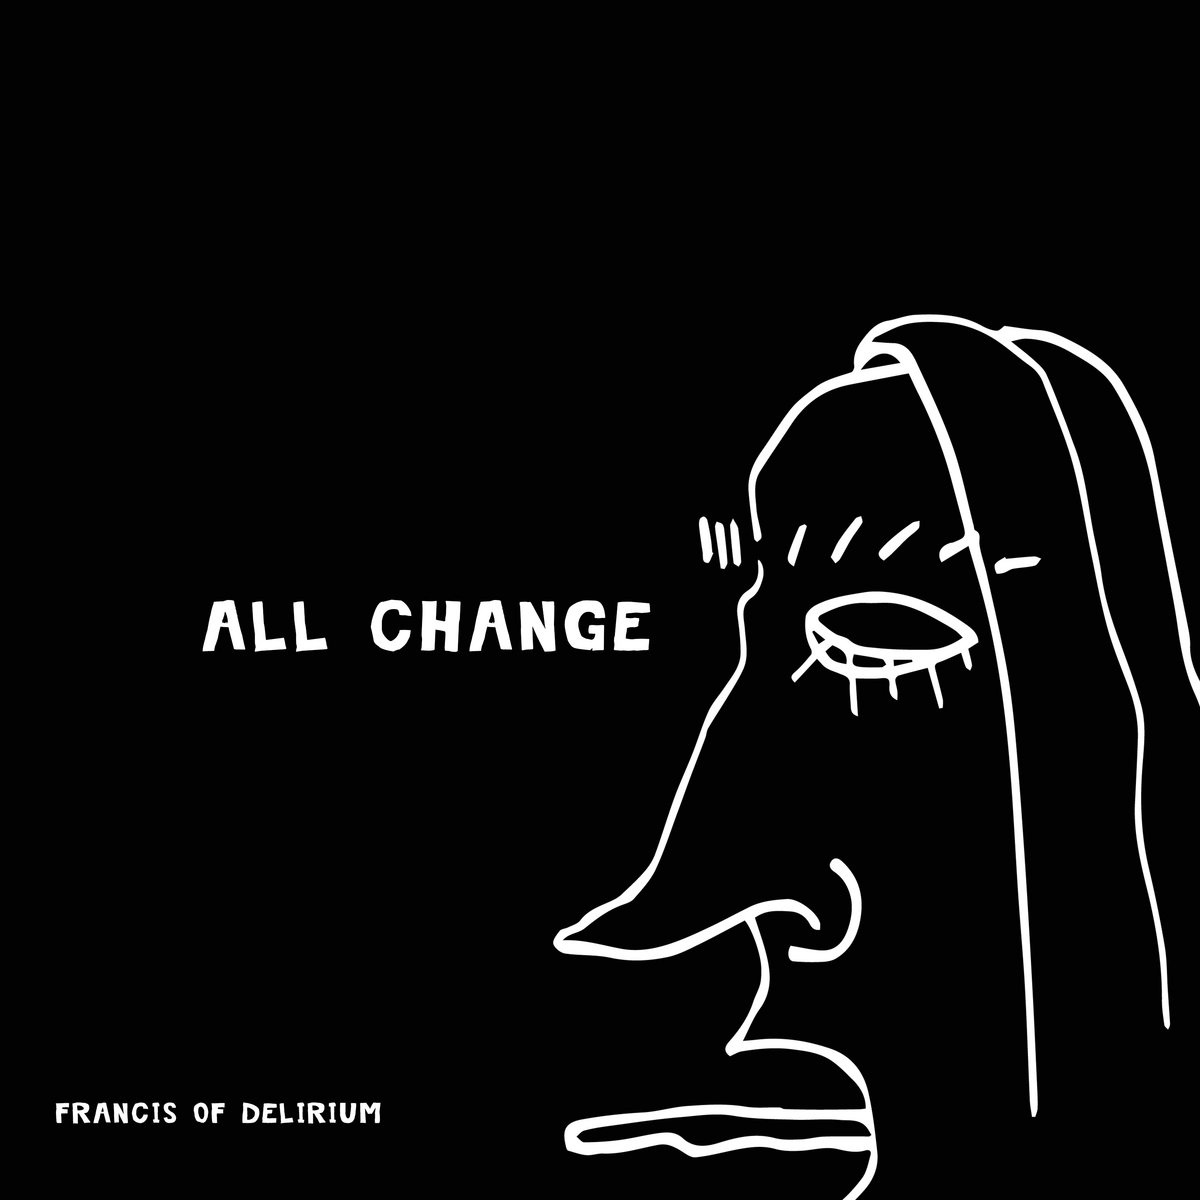 Francis of Delirium